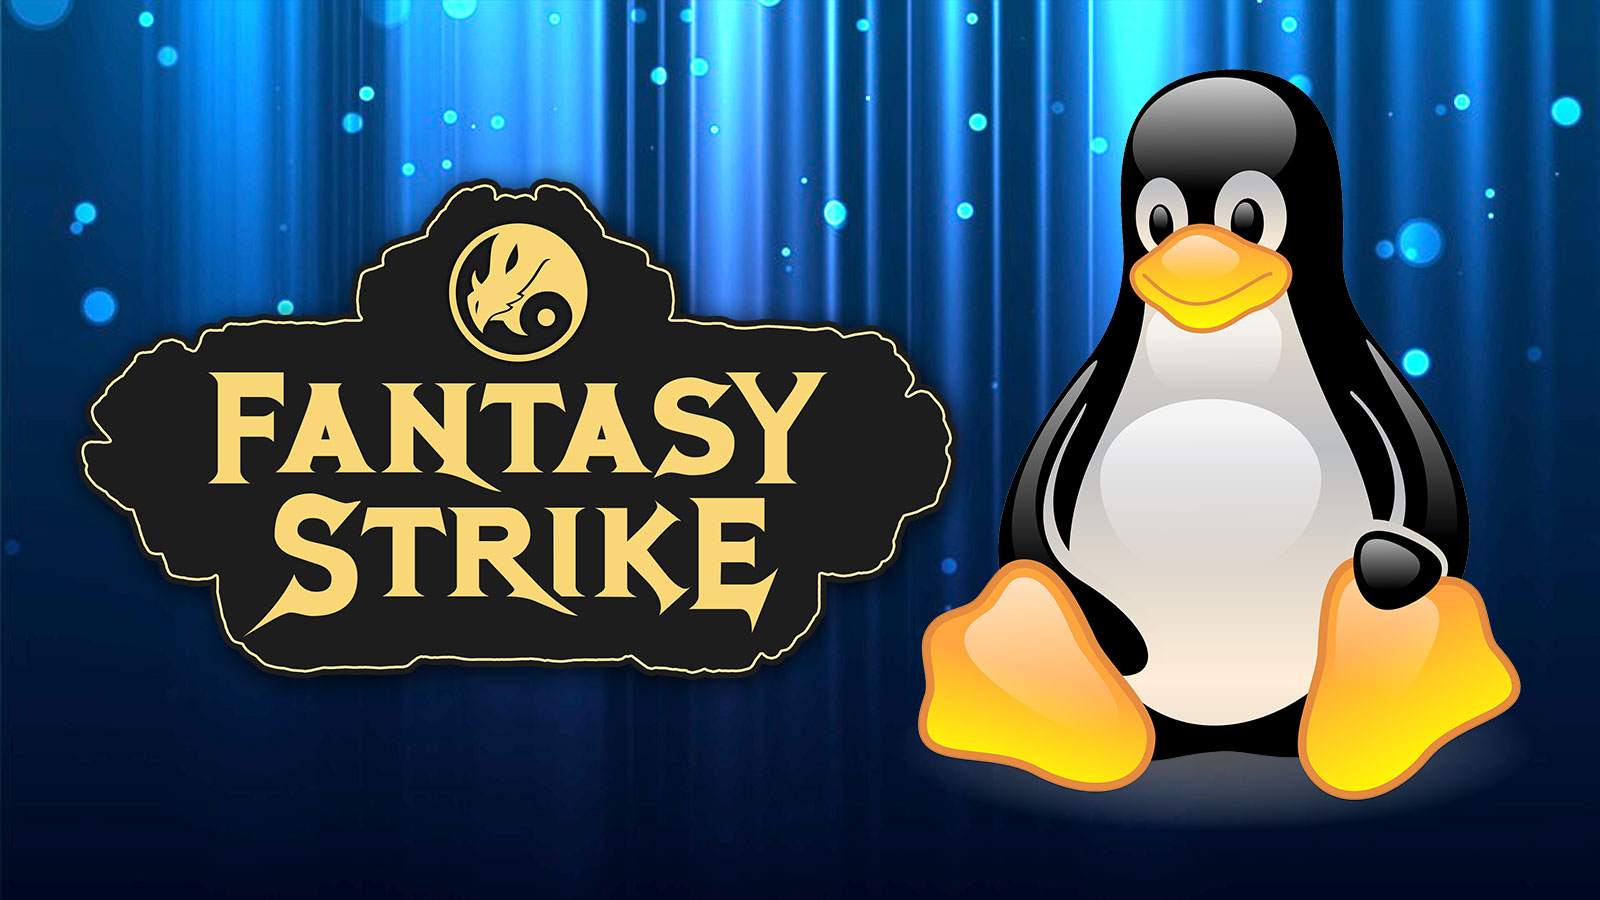 fantasystrike_linux.jpg